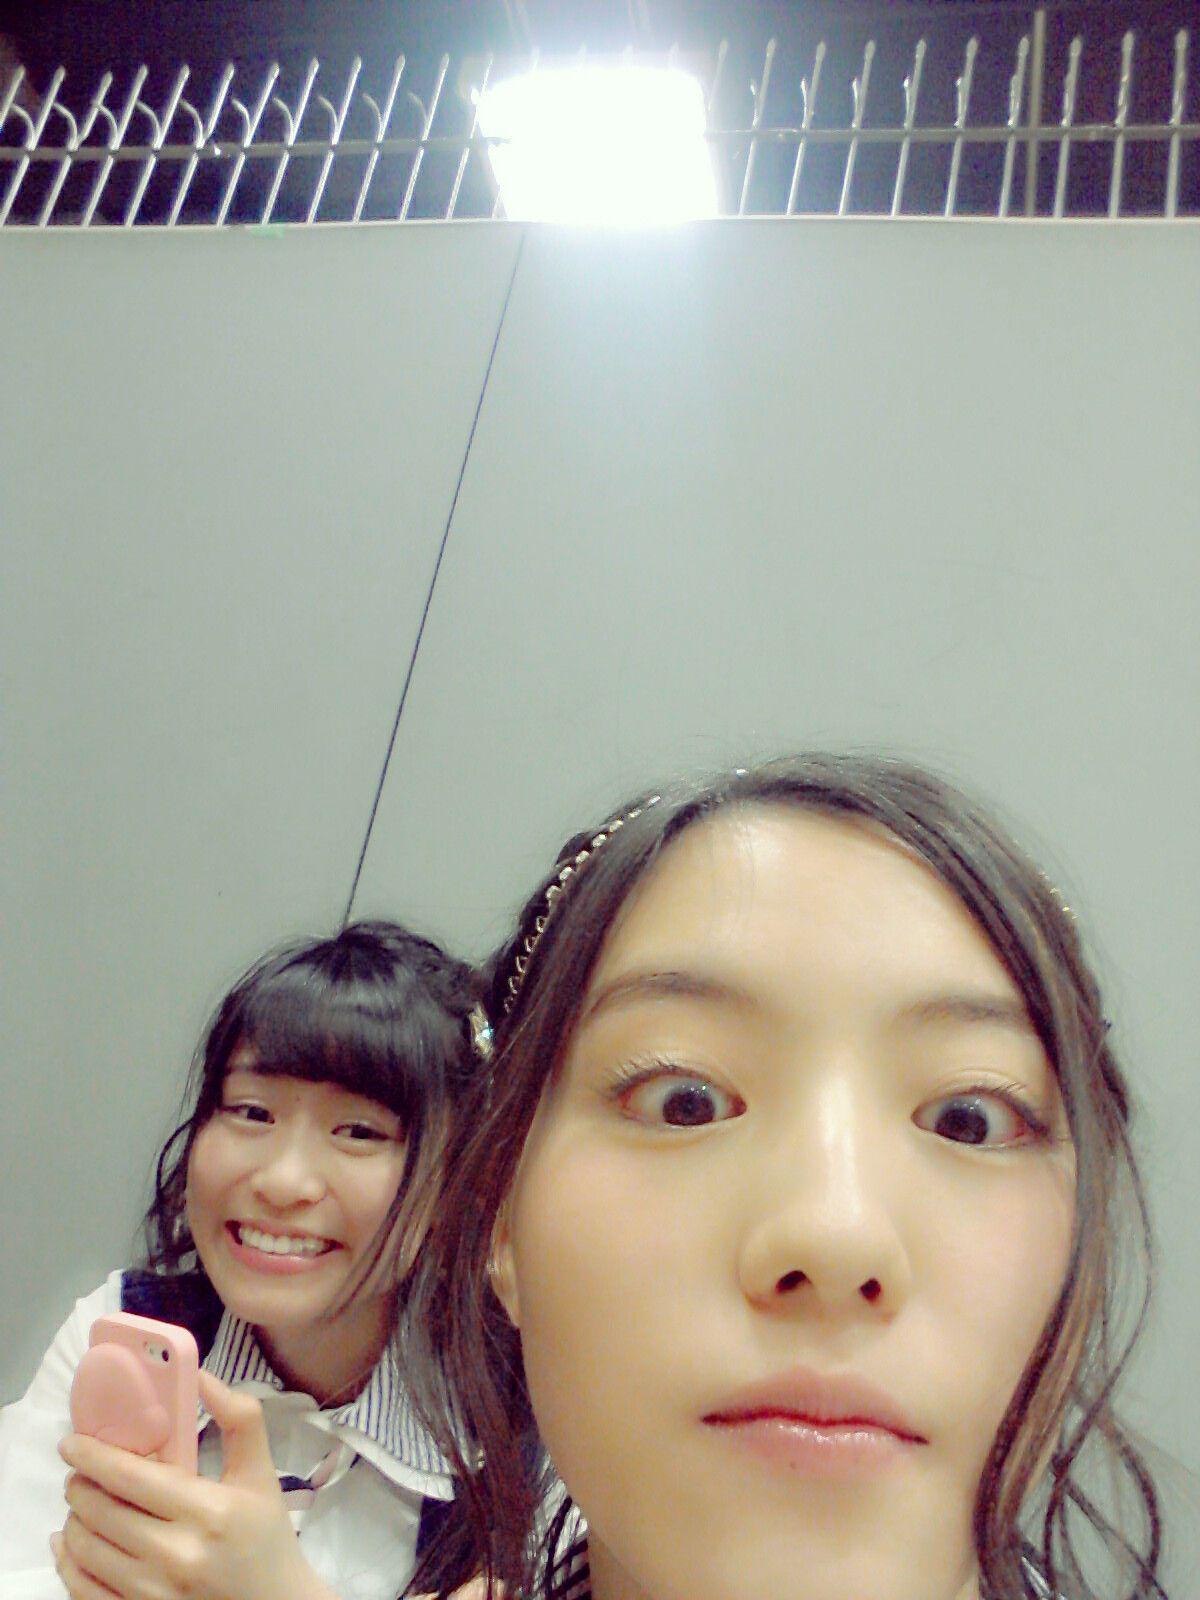 Kokoro Naiki x Anna Ijiri  https://plus.google.com/u/0/107410599171378978168/posts/ASmaYe5P9Wu